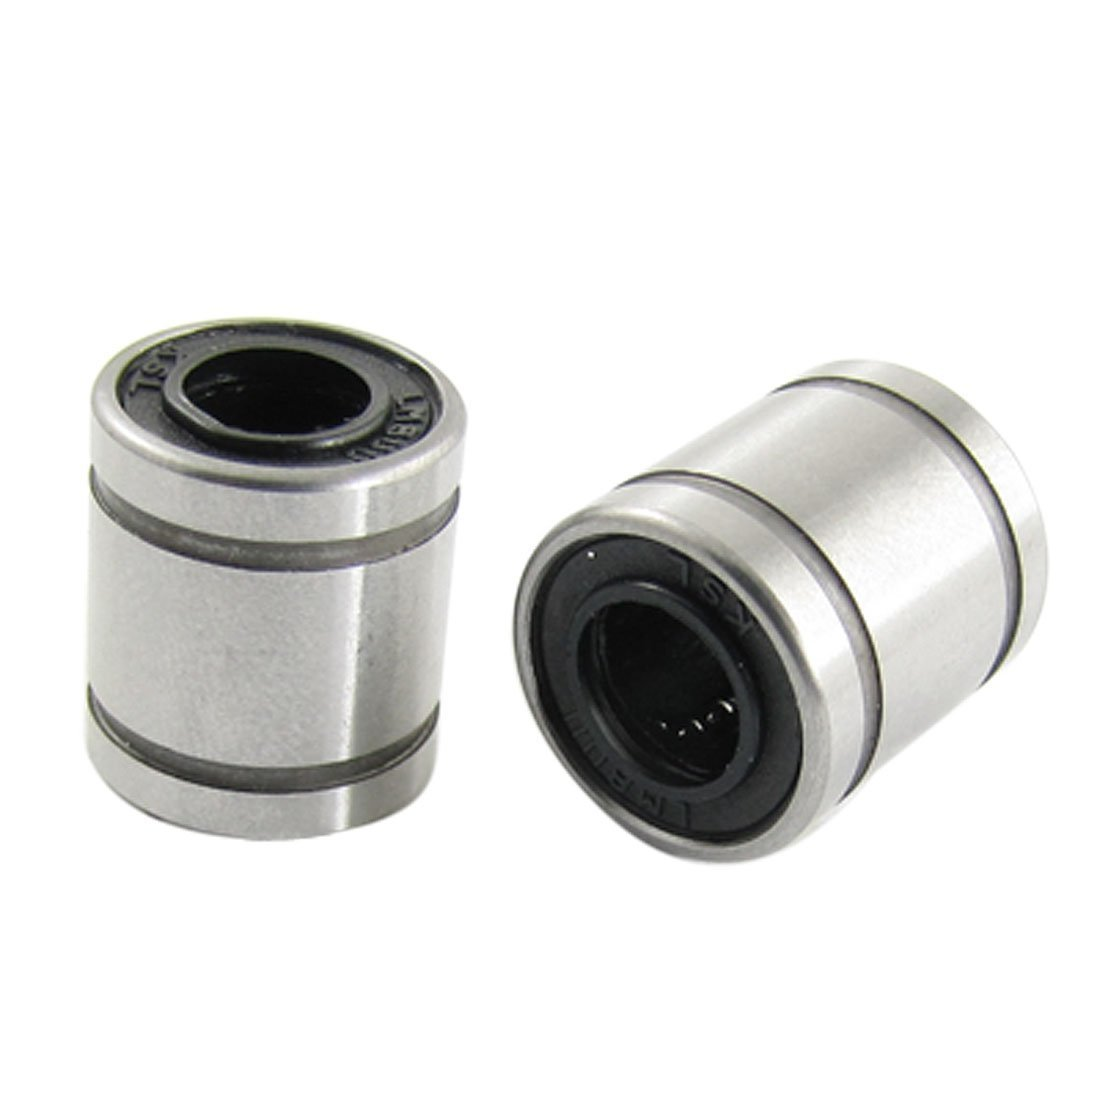 sourcingmap 2 Pcs 8mm x 15mm x 17mm Linear Motion Ball Bearings US-SA-AJD-13679